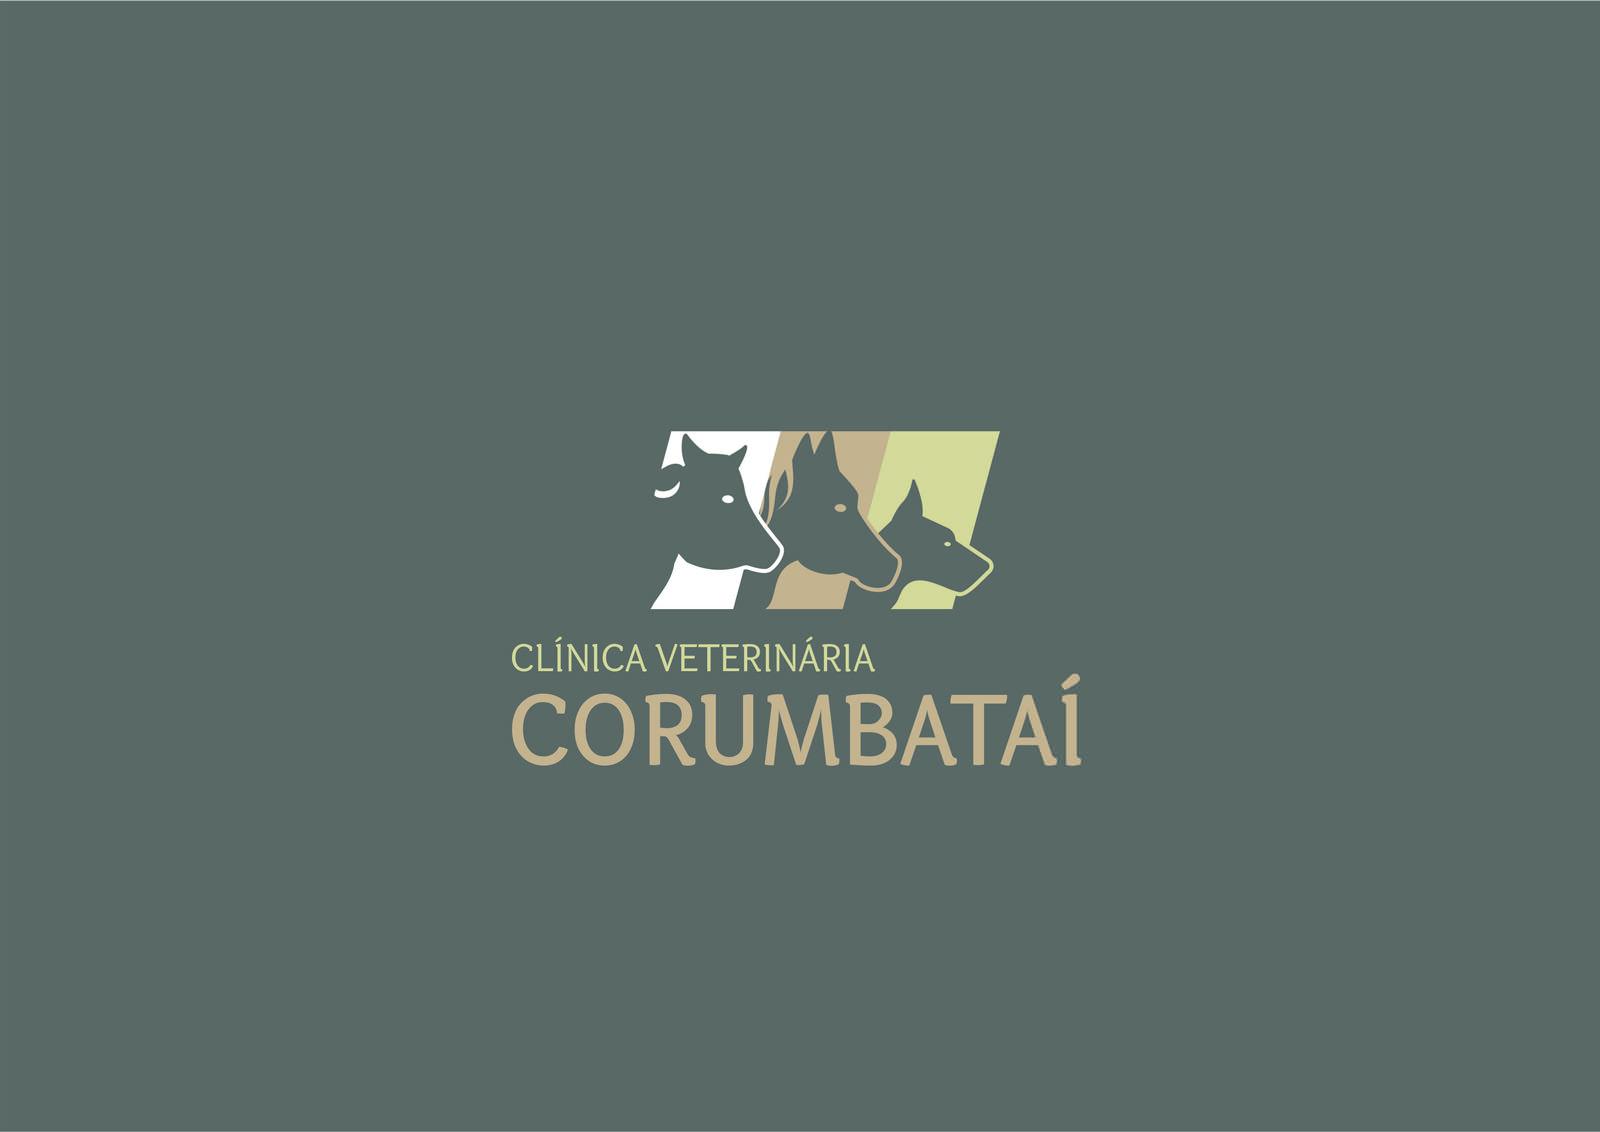 Clínica Veterinária Corumbataí